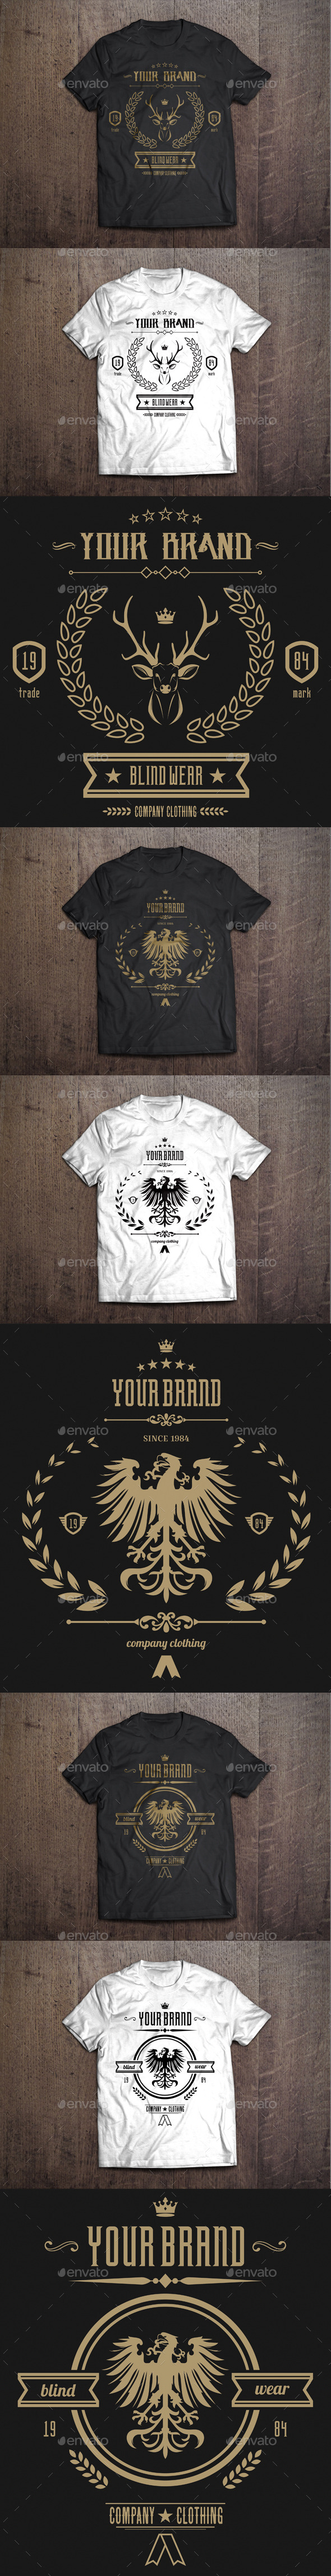 3 T-Shirt Template #1 - T-Shirts